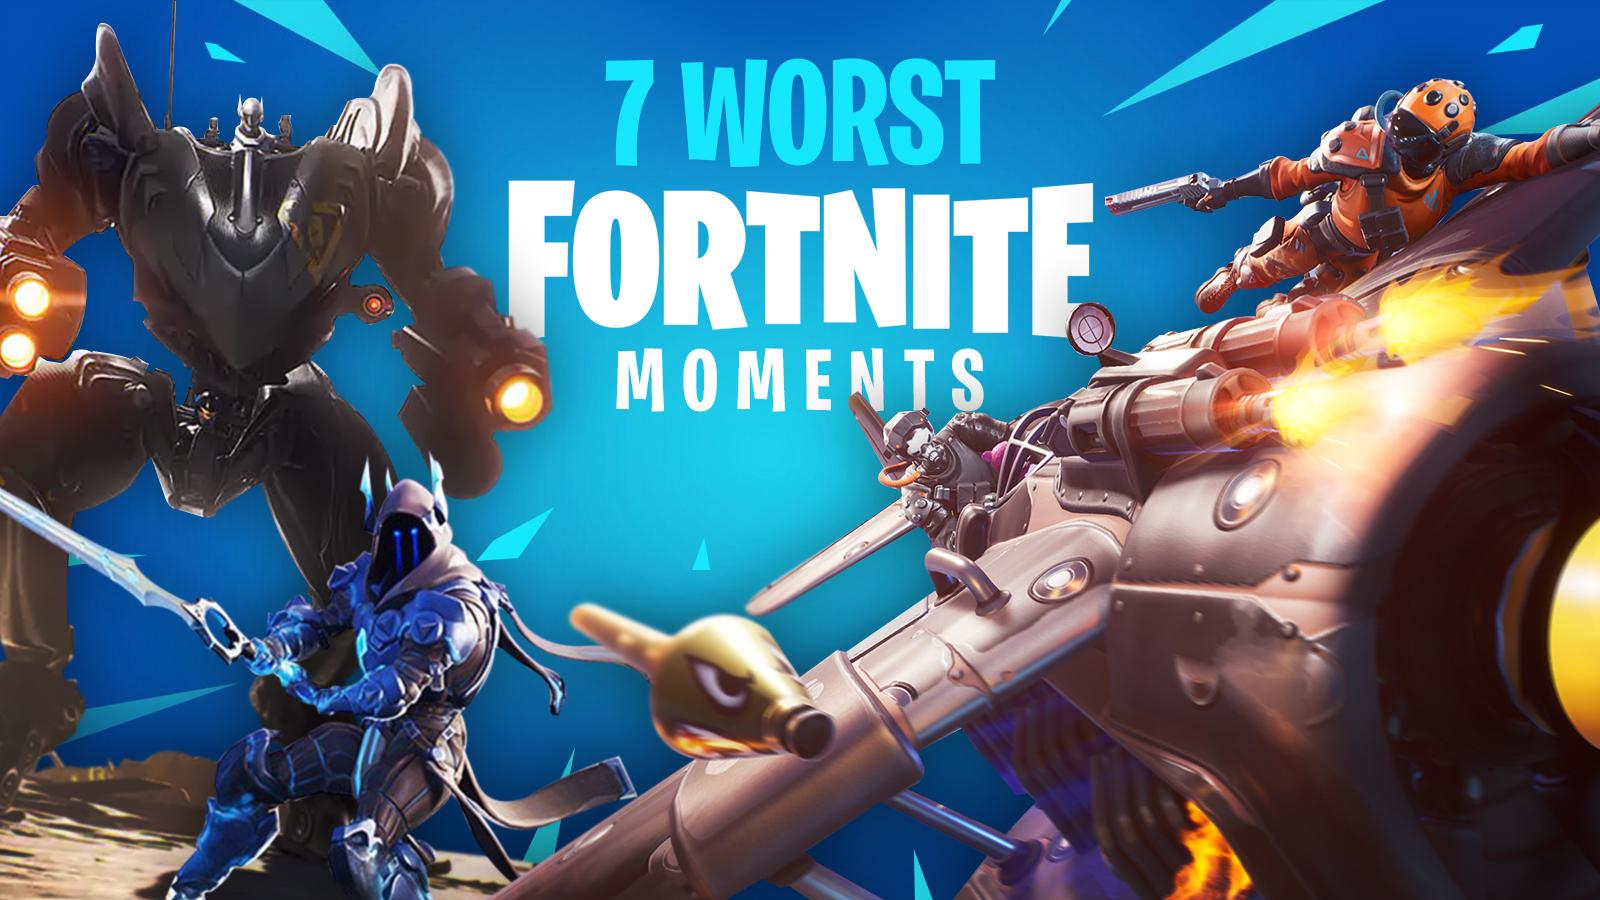 Fortnite worst moments image